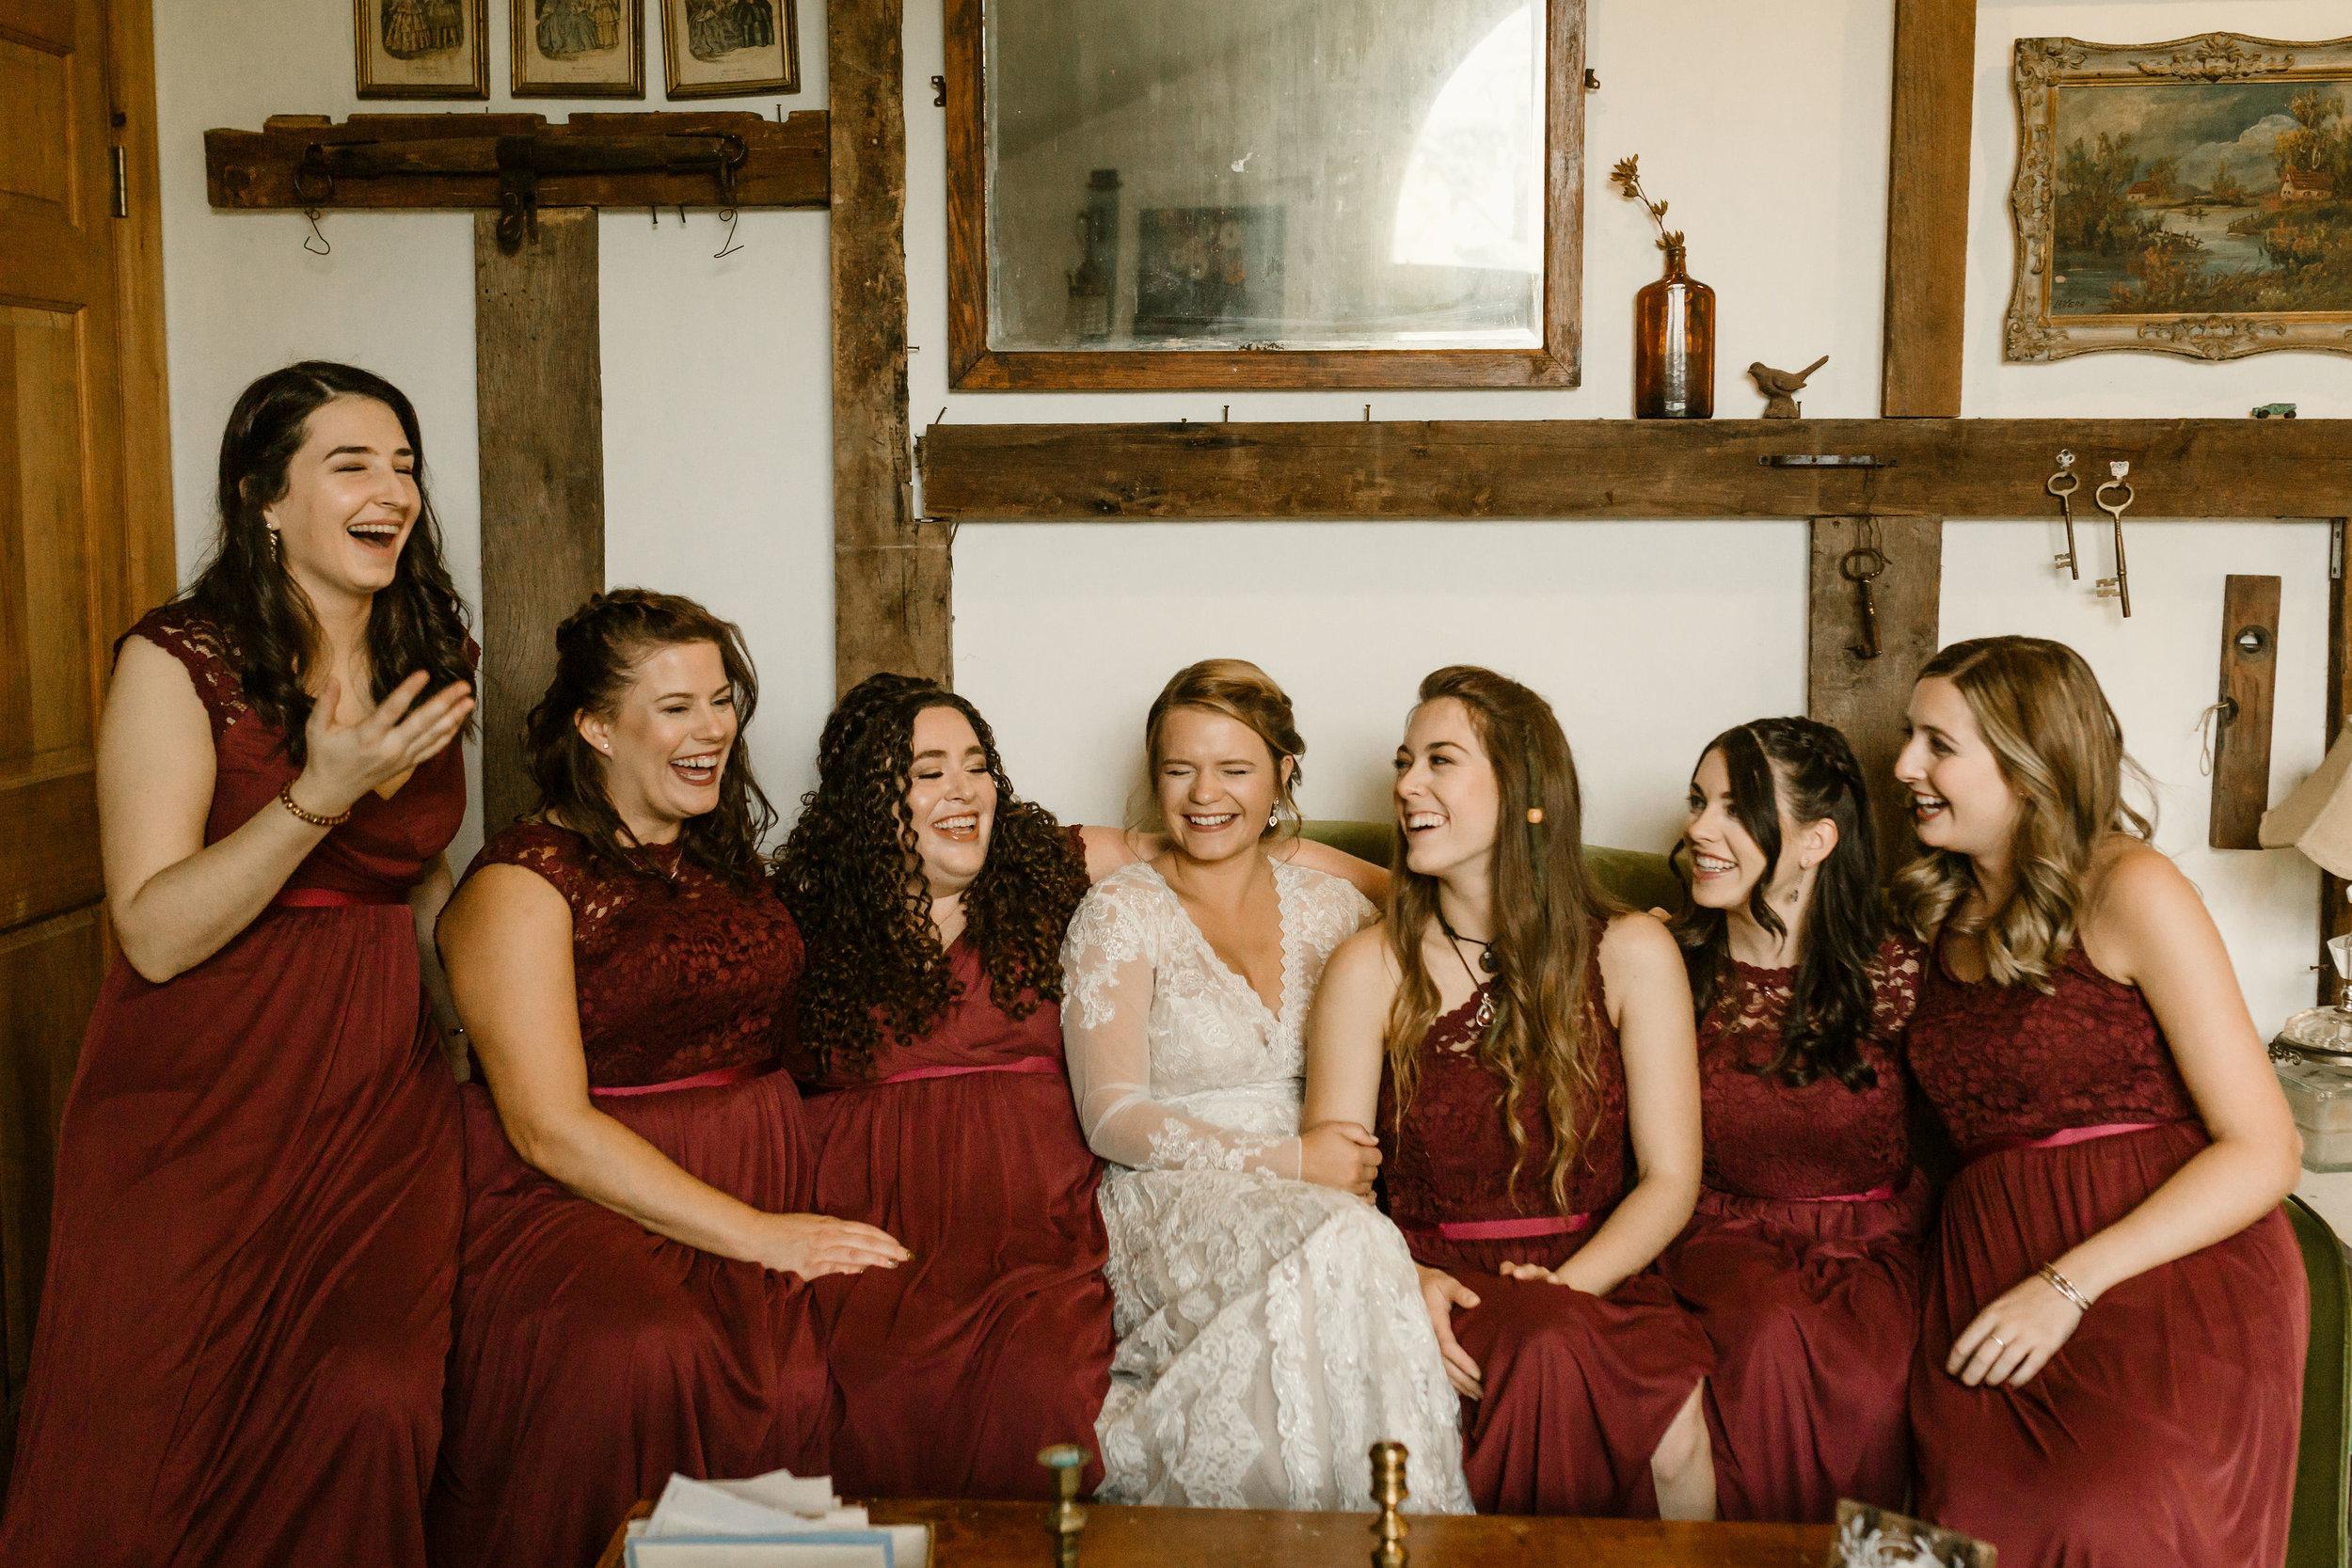 young-love-media-rustic-fall-autumn-wedding-emmerich-tree-farm-hudson-valley-warwick-new-york-getting-ready-143.jpg